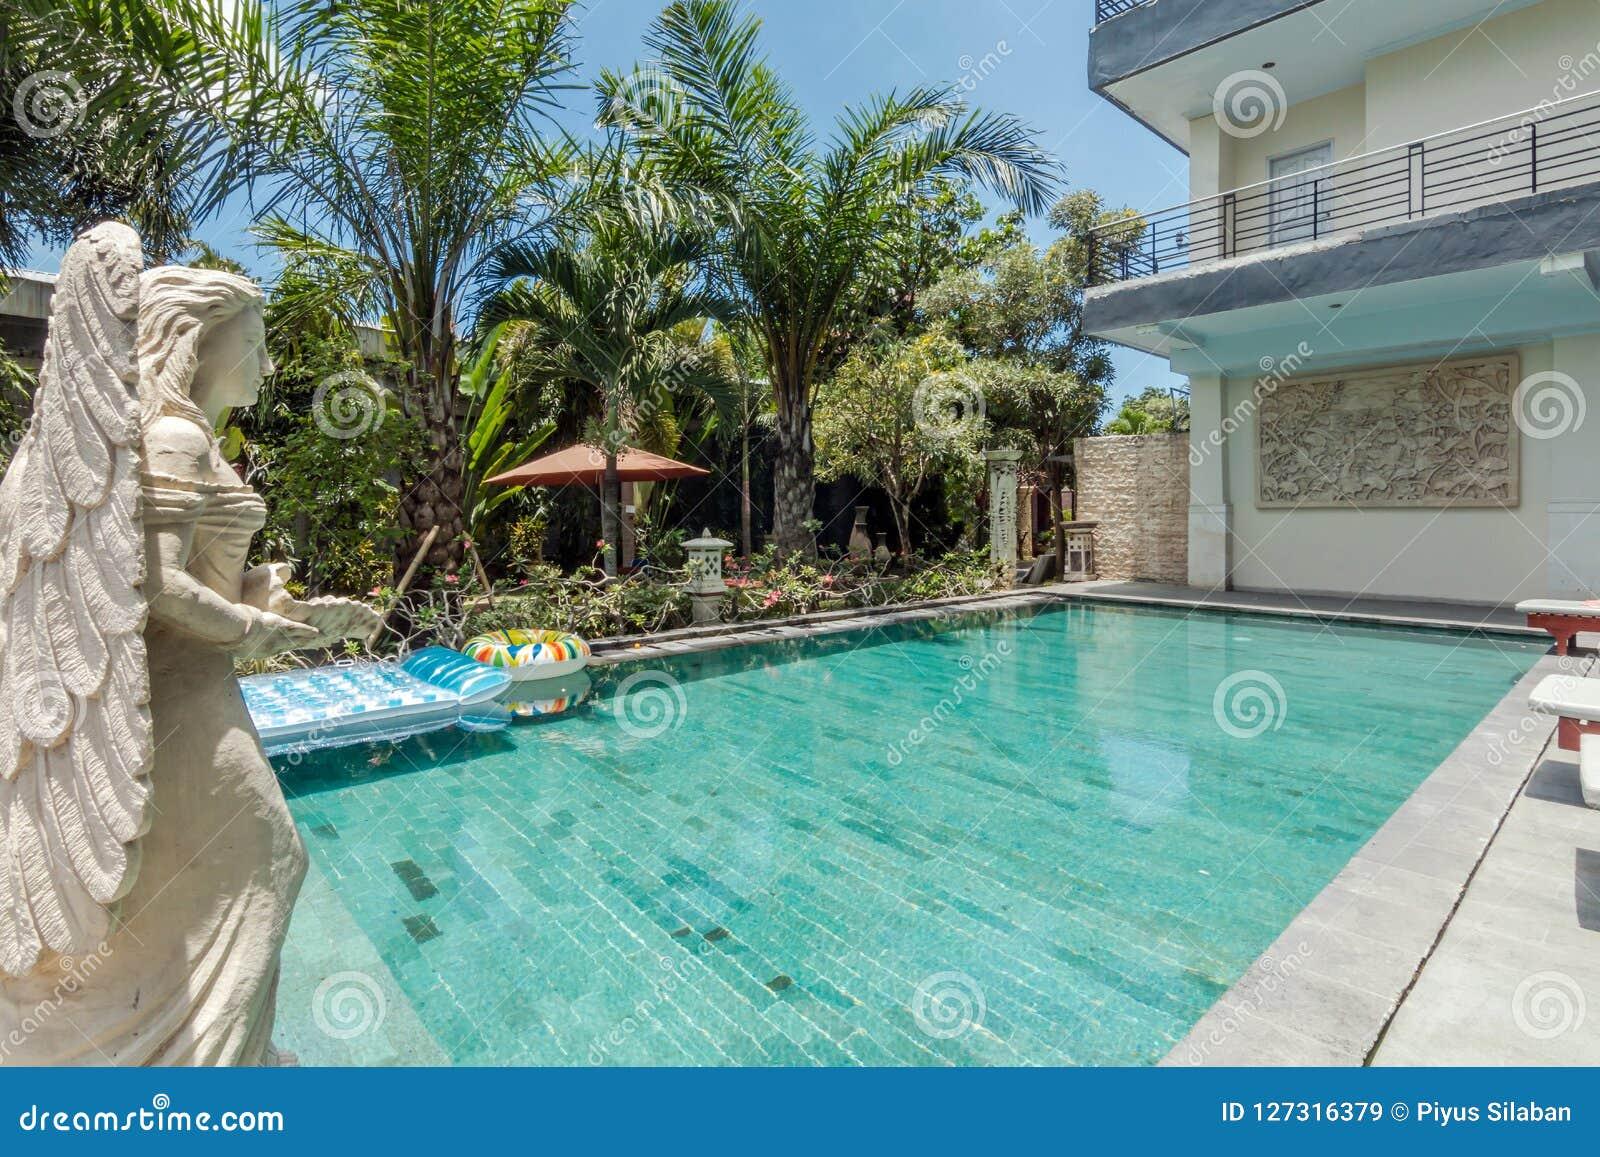 Beautiful Swimming Pool At Cheap Hotel Stock Image - Image ...